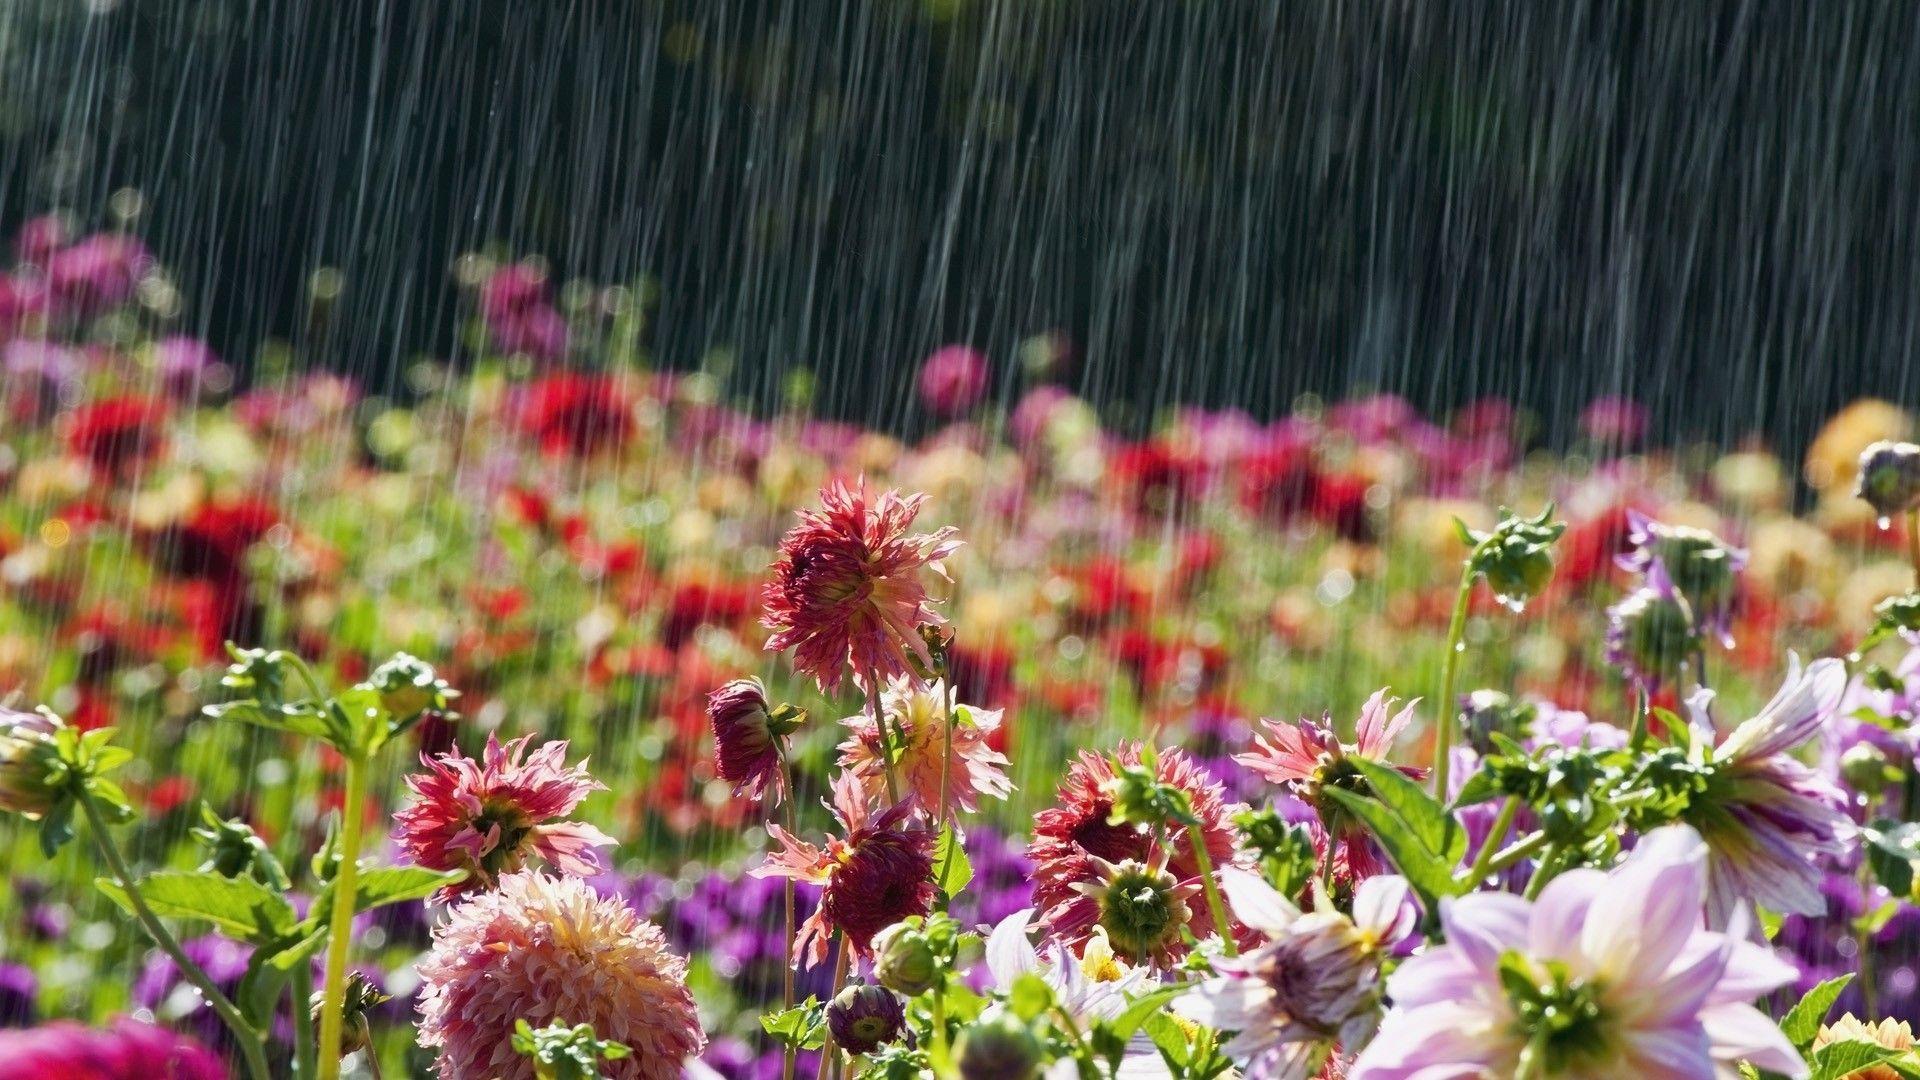 1920x1080 Rainy Season Hd Wallpapers Rain Makes Our Life Most Beautiful So Rainy Season Good Morning Rainy Day Good Morning Rain Good Morning Rainy